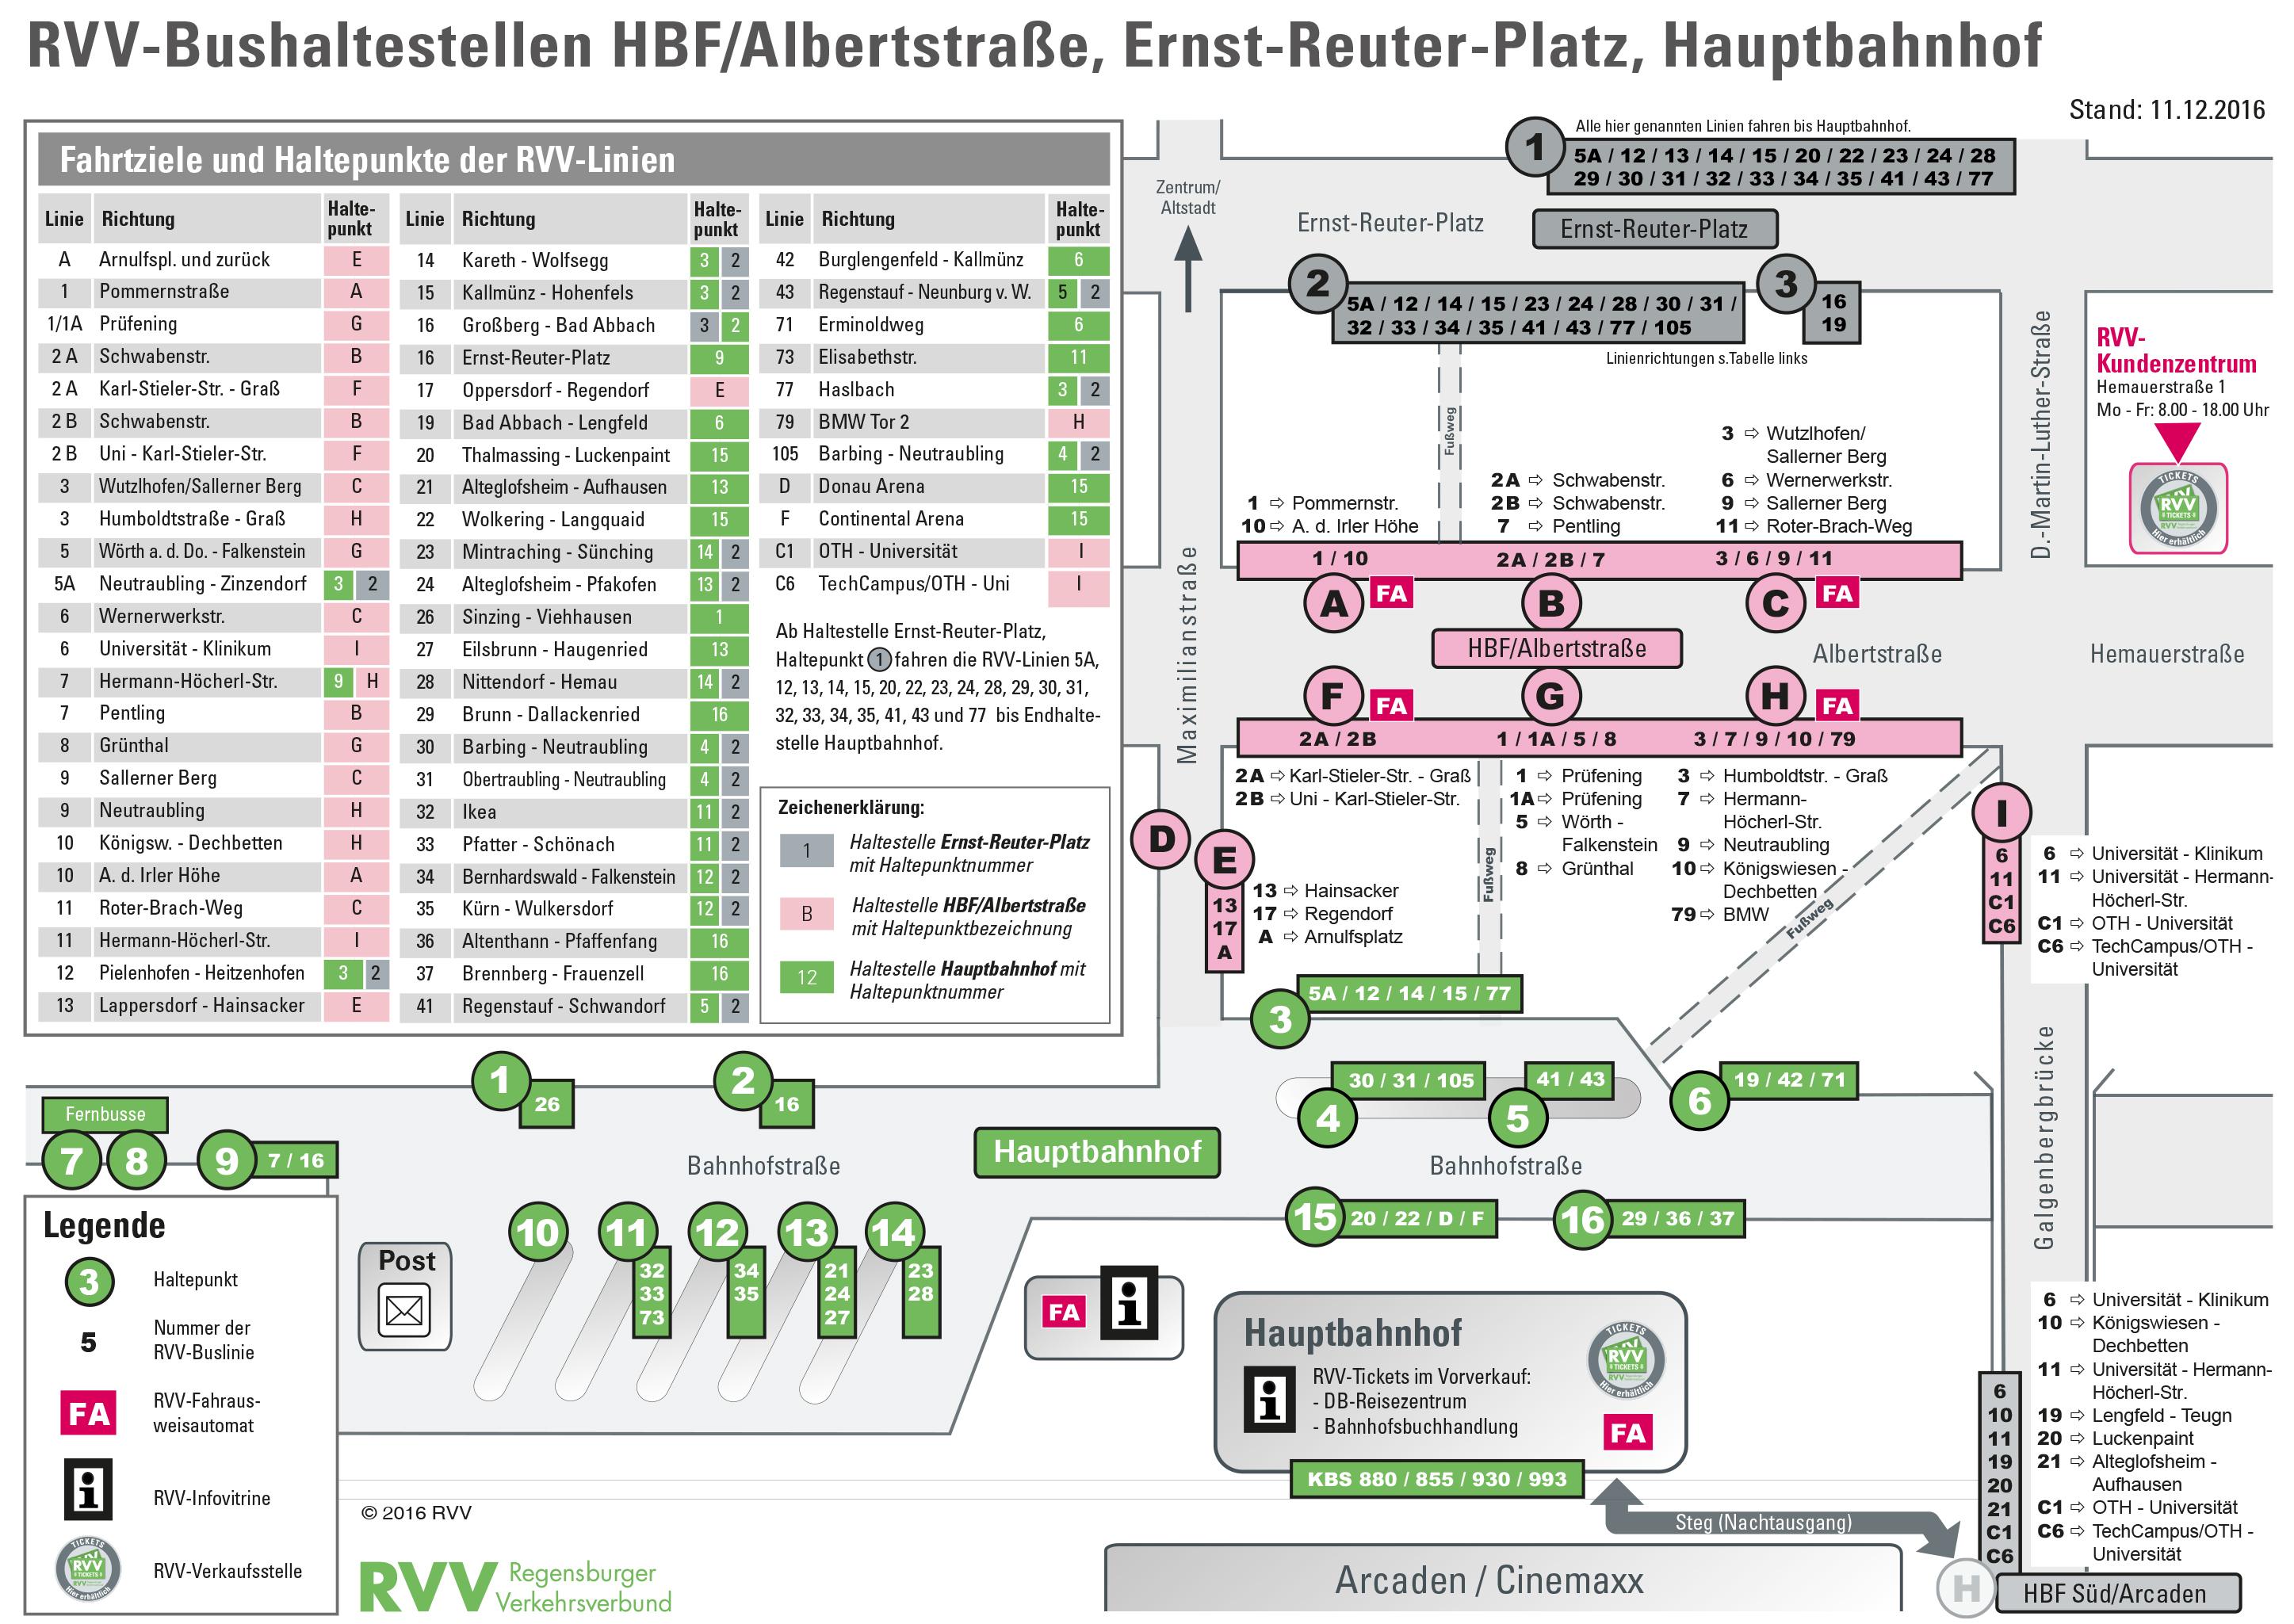 overview map of the stops at hauptbahnhof hbf albertstra e ernst reuter platz regensburger. Black Bedroom Furniture Sets. Home Design Ideas